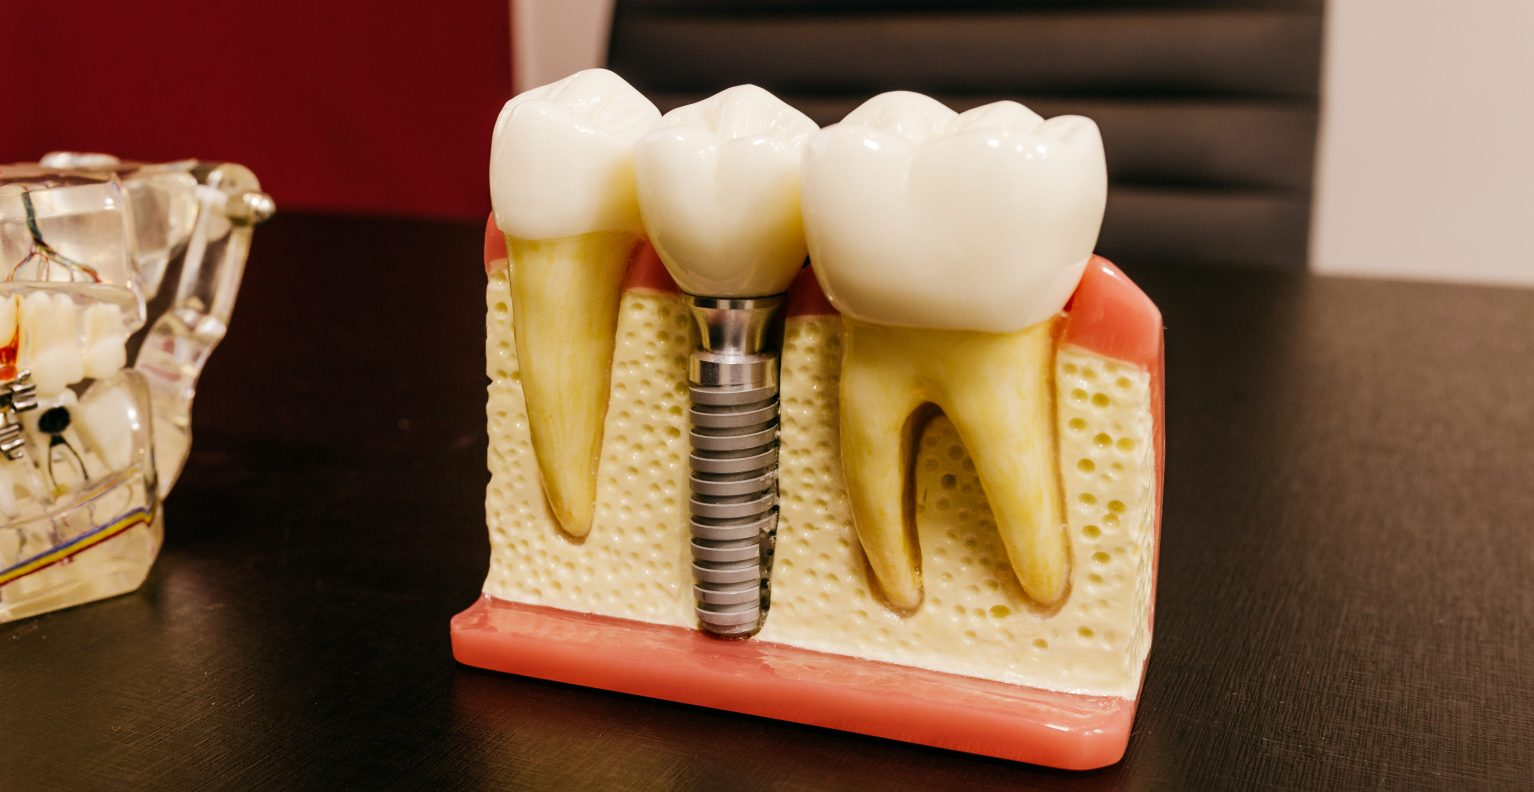 dental implants in taylor